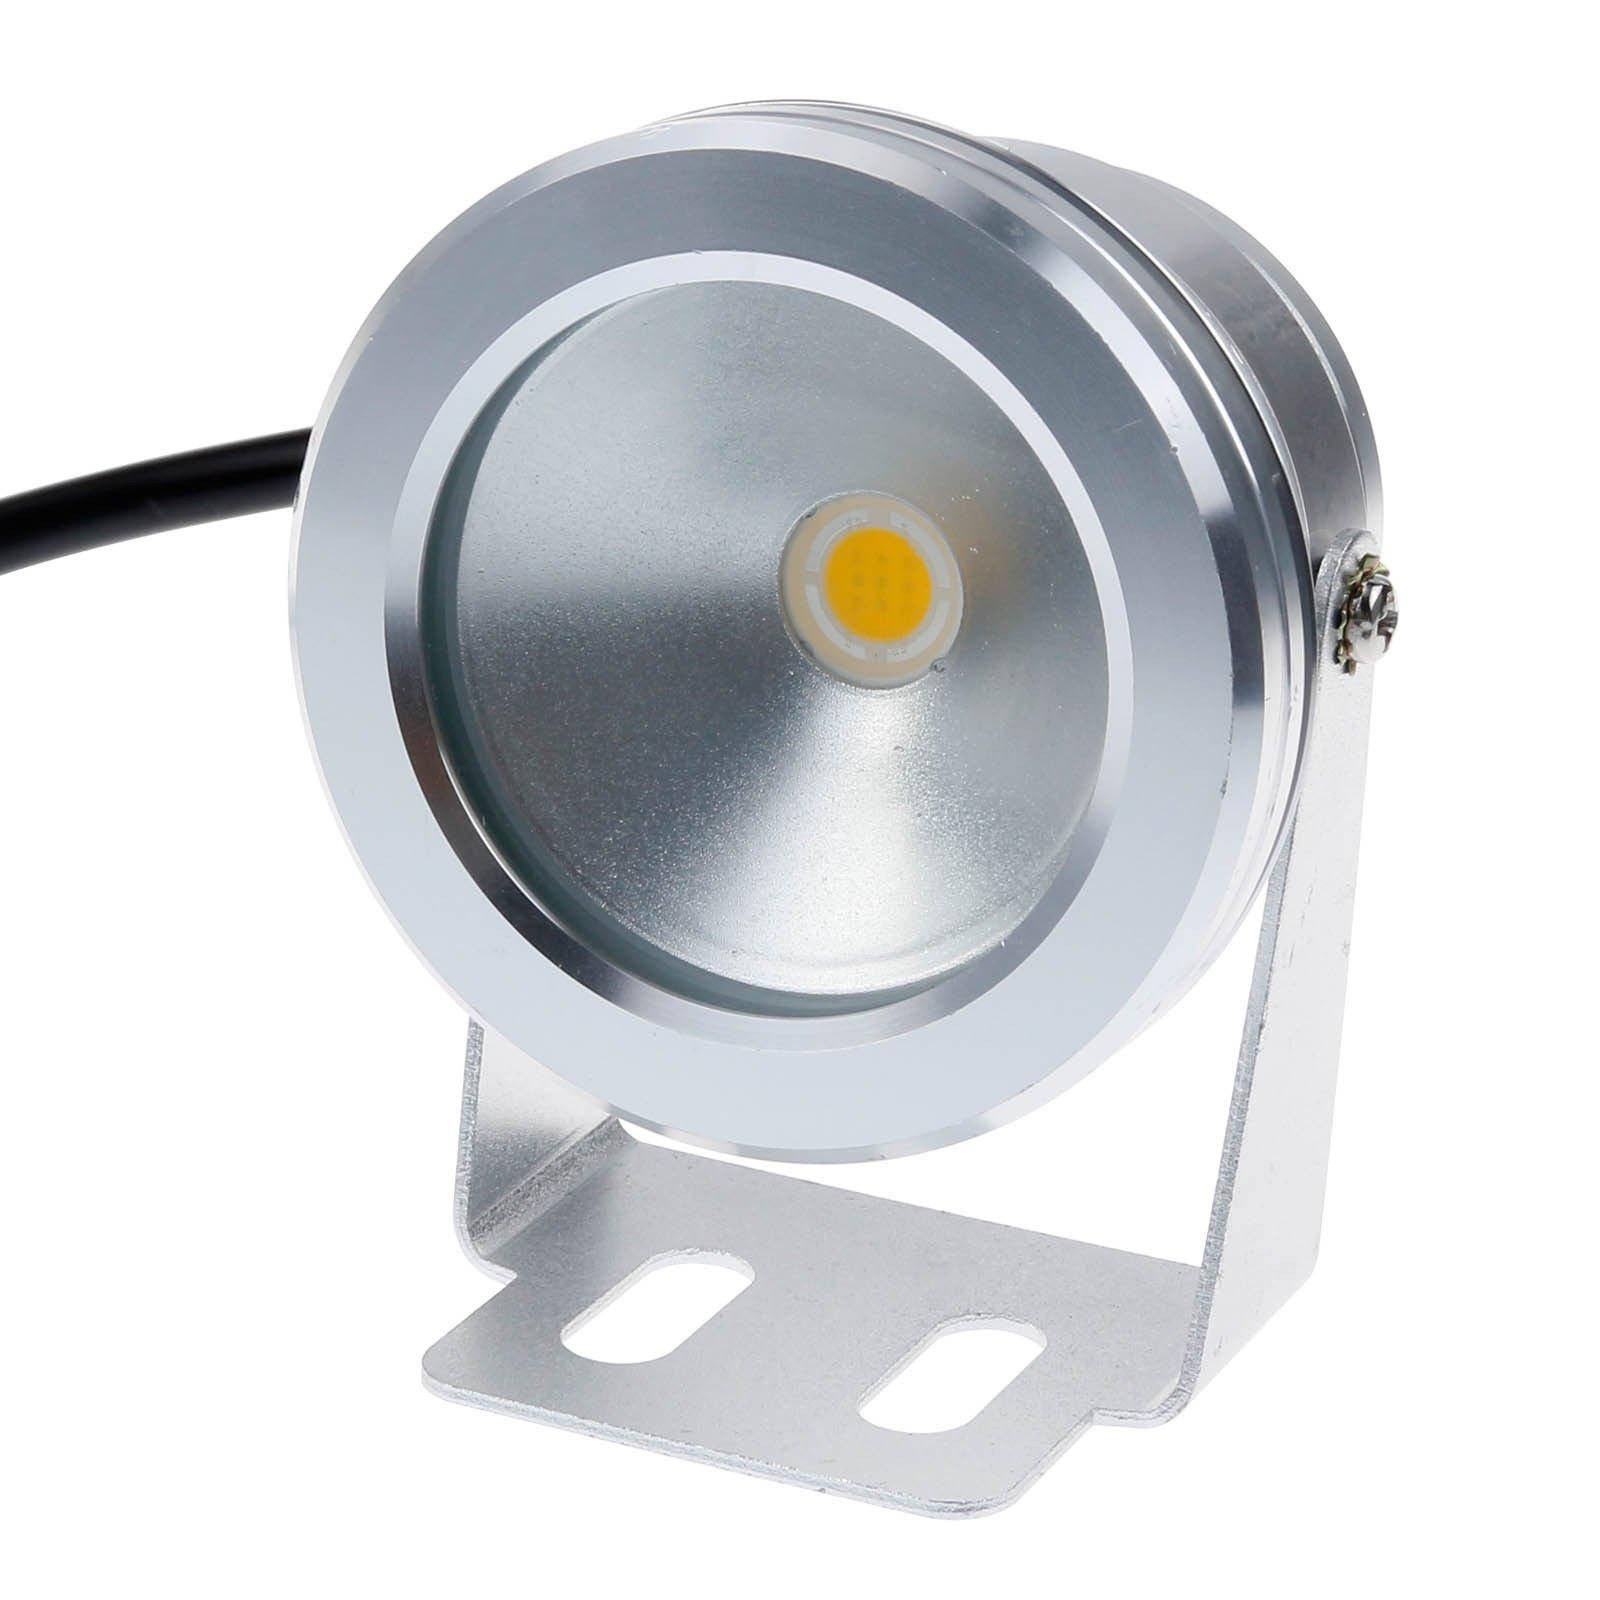 Zxlight®10w 12v Silver LED Underwater Flood Light, Ip68 Waterproof Landscape Fountain Lamp, Warm White,white,rgb (10, Warm White)